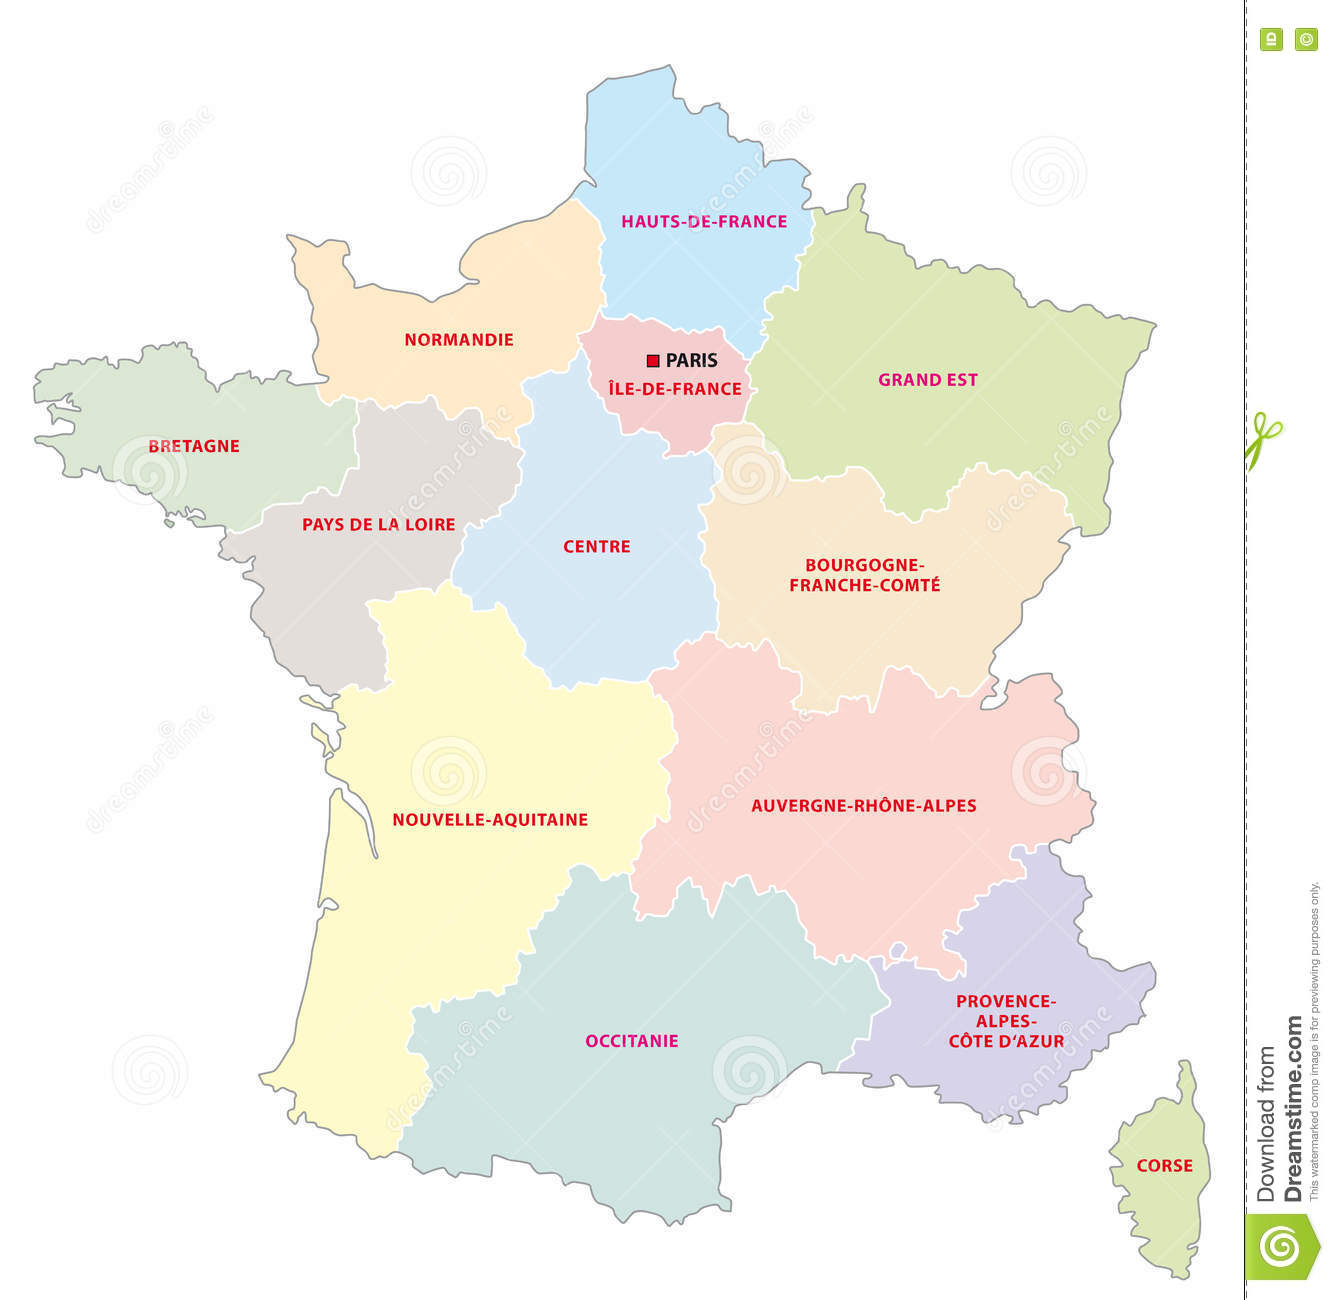 Administrative Map Of The 13 Regions Of France Since 2016 intérieur Les 13 Régions